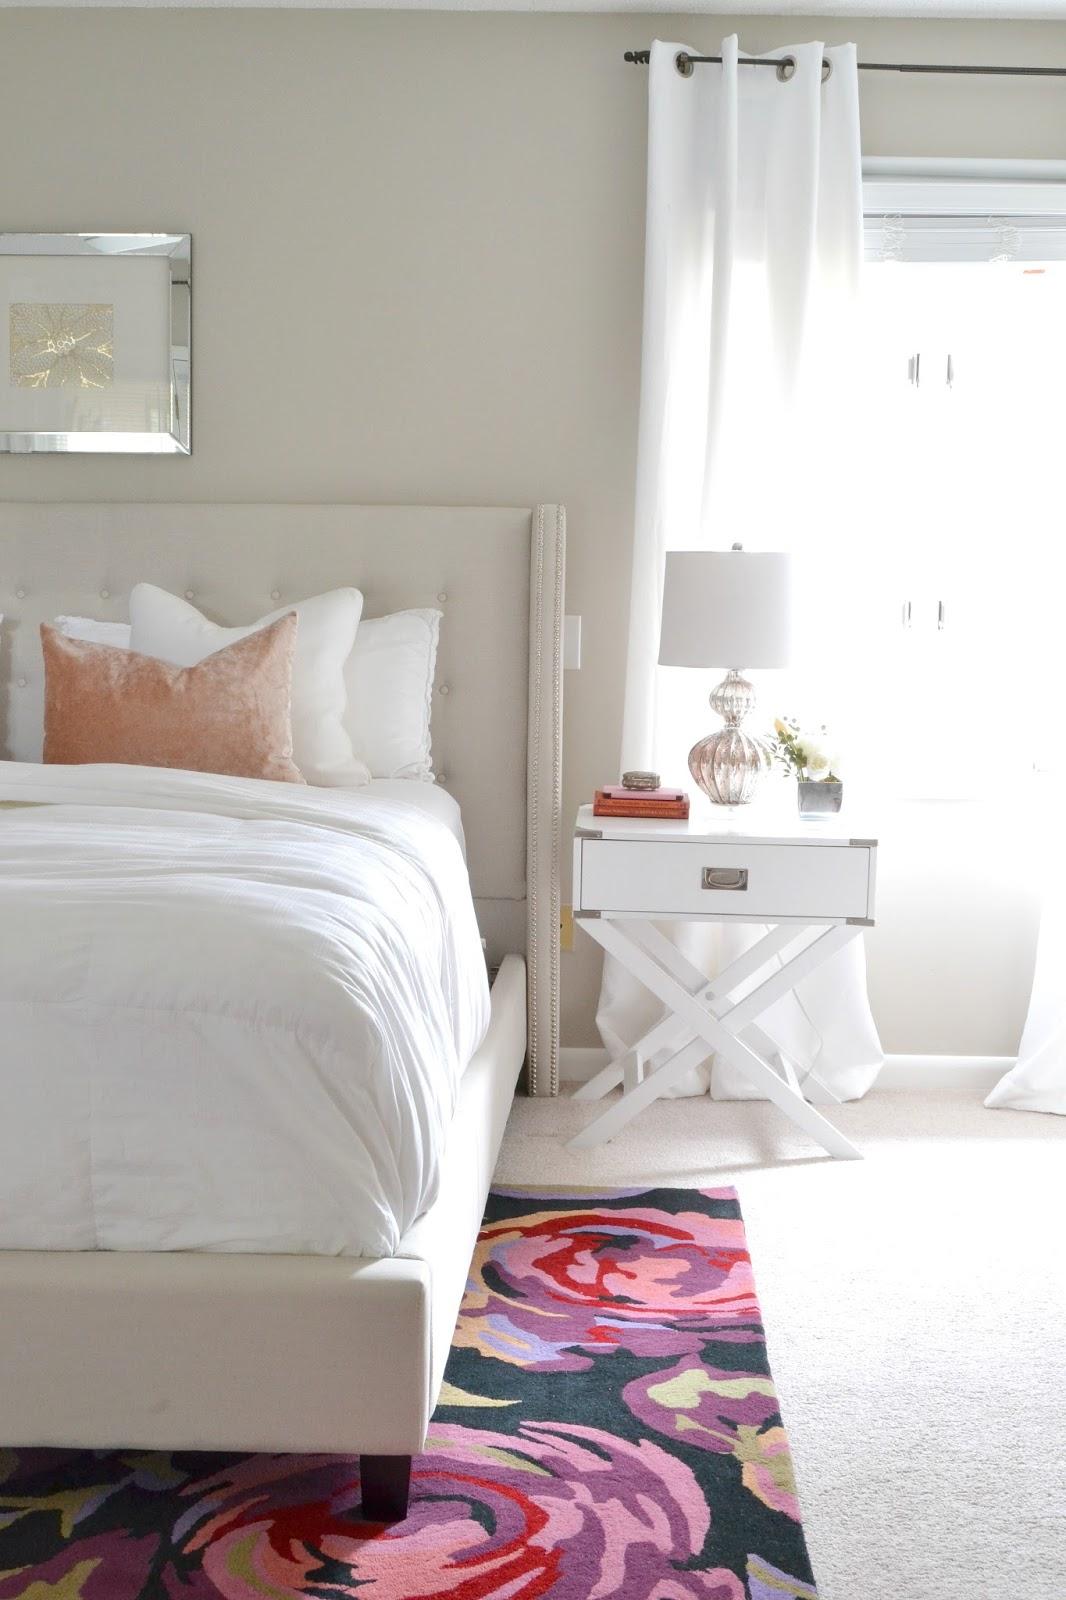 LiveLoveDIY: Master bedroom decorating updates!